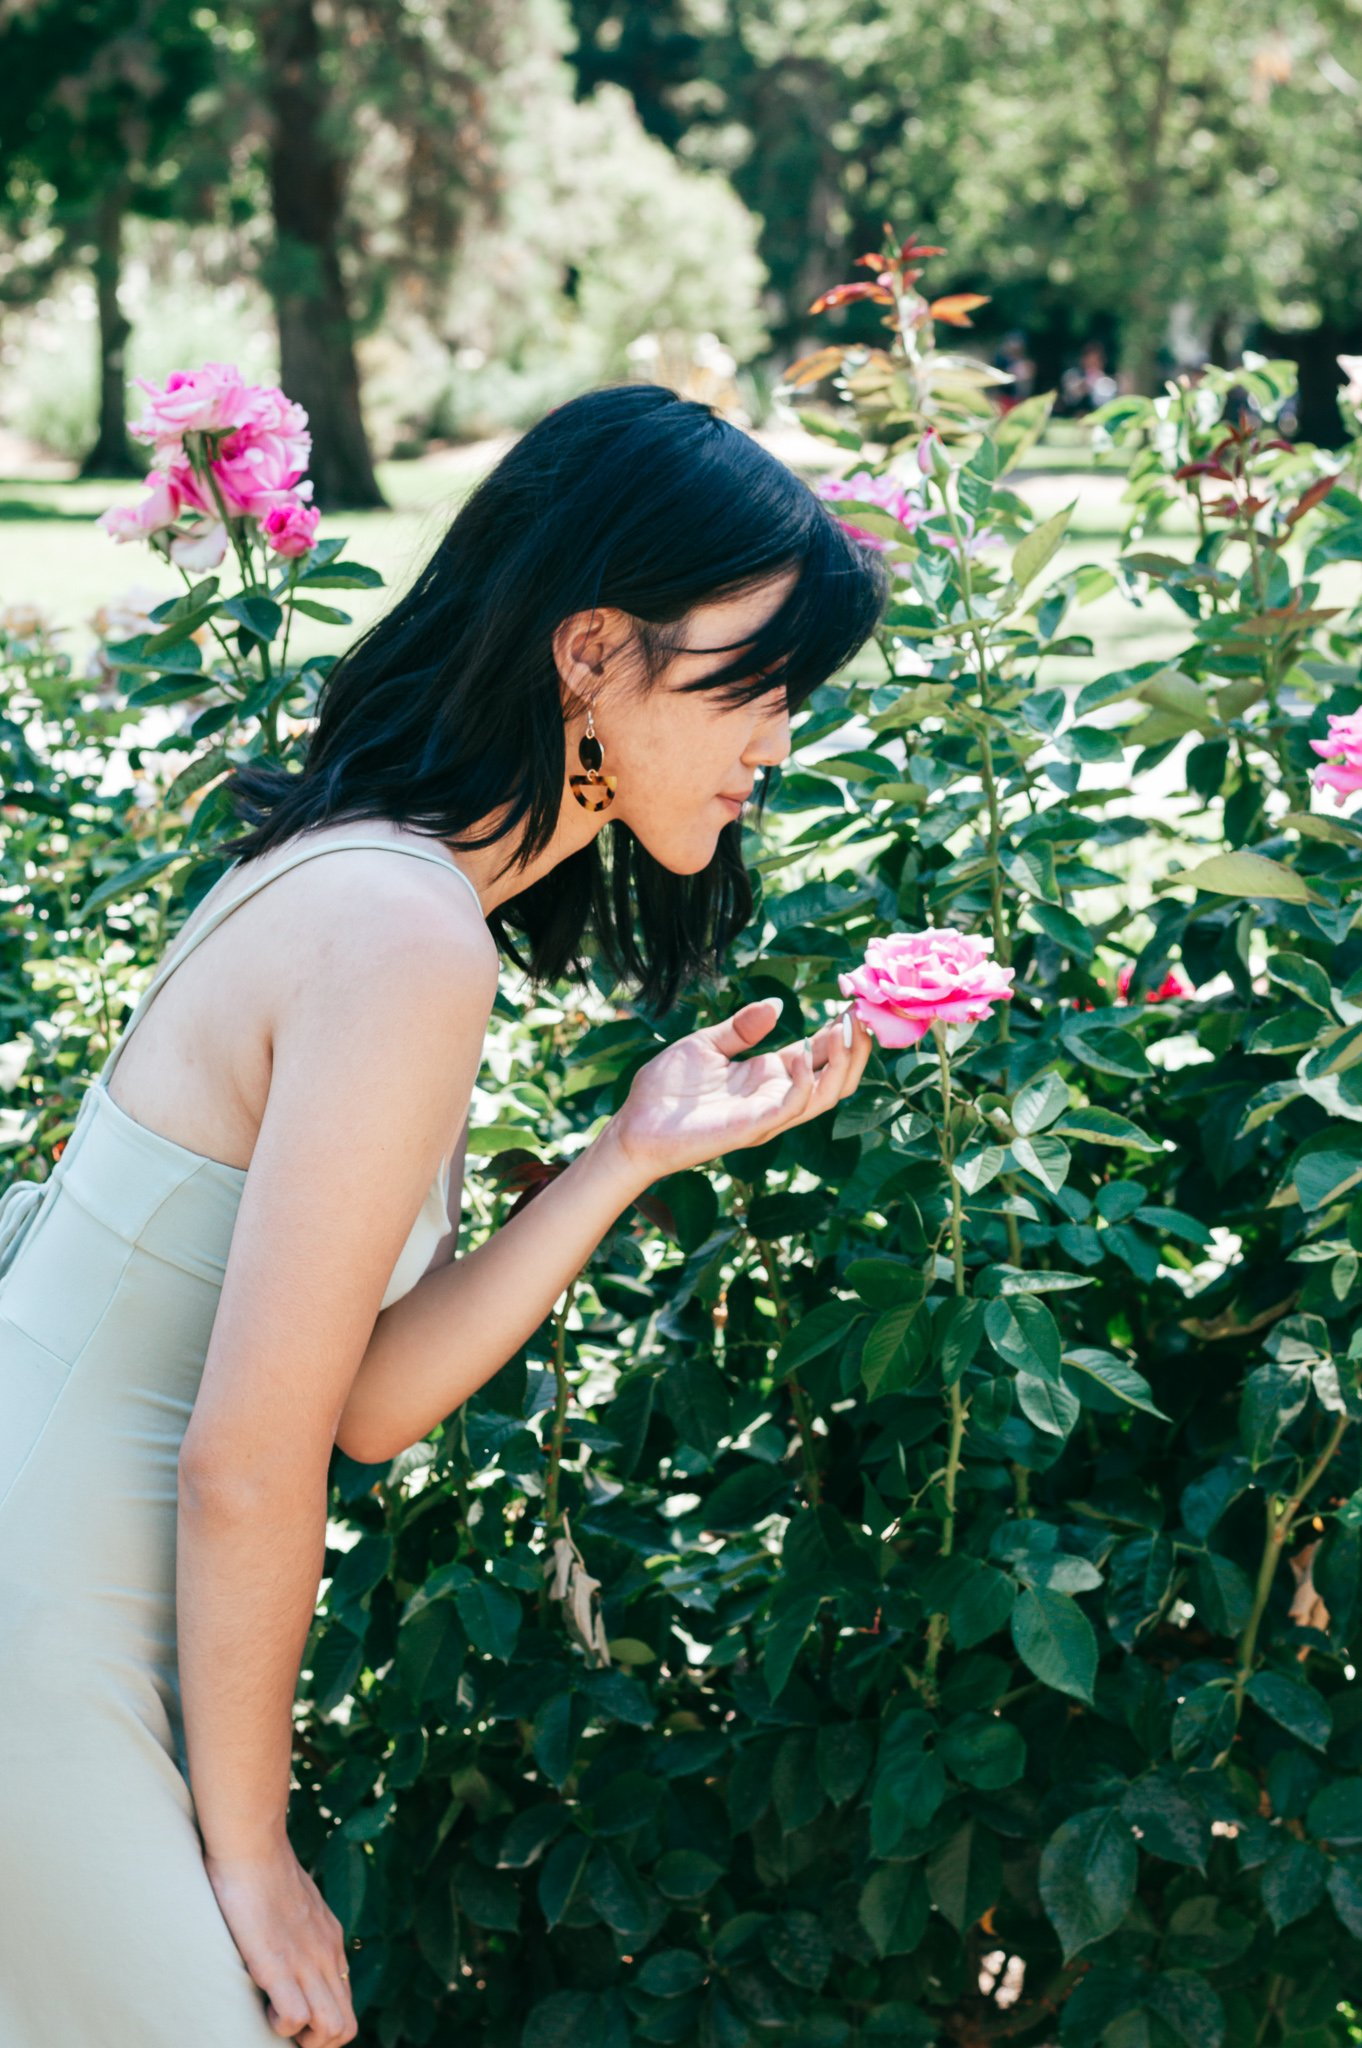 Rose garden outfit